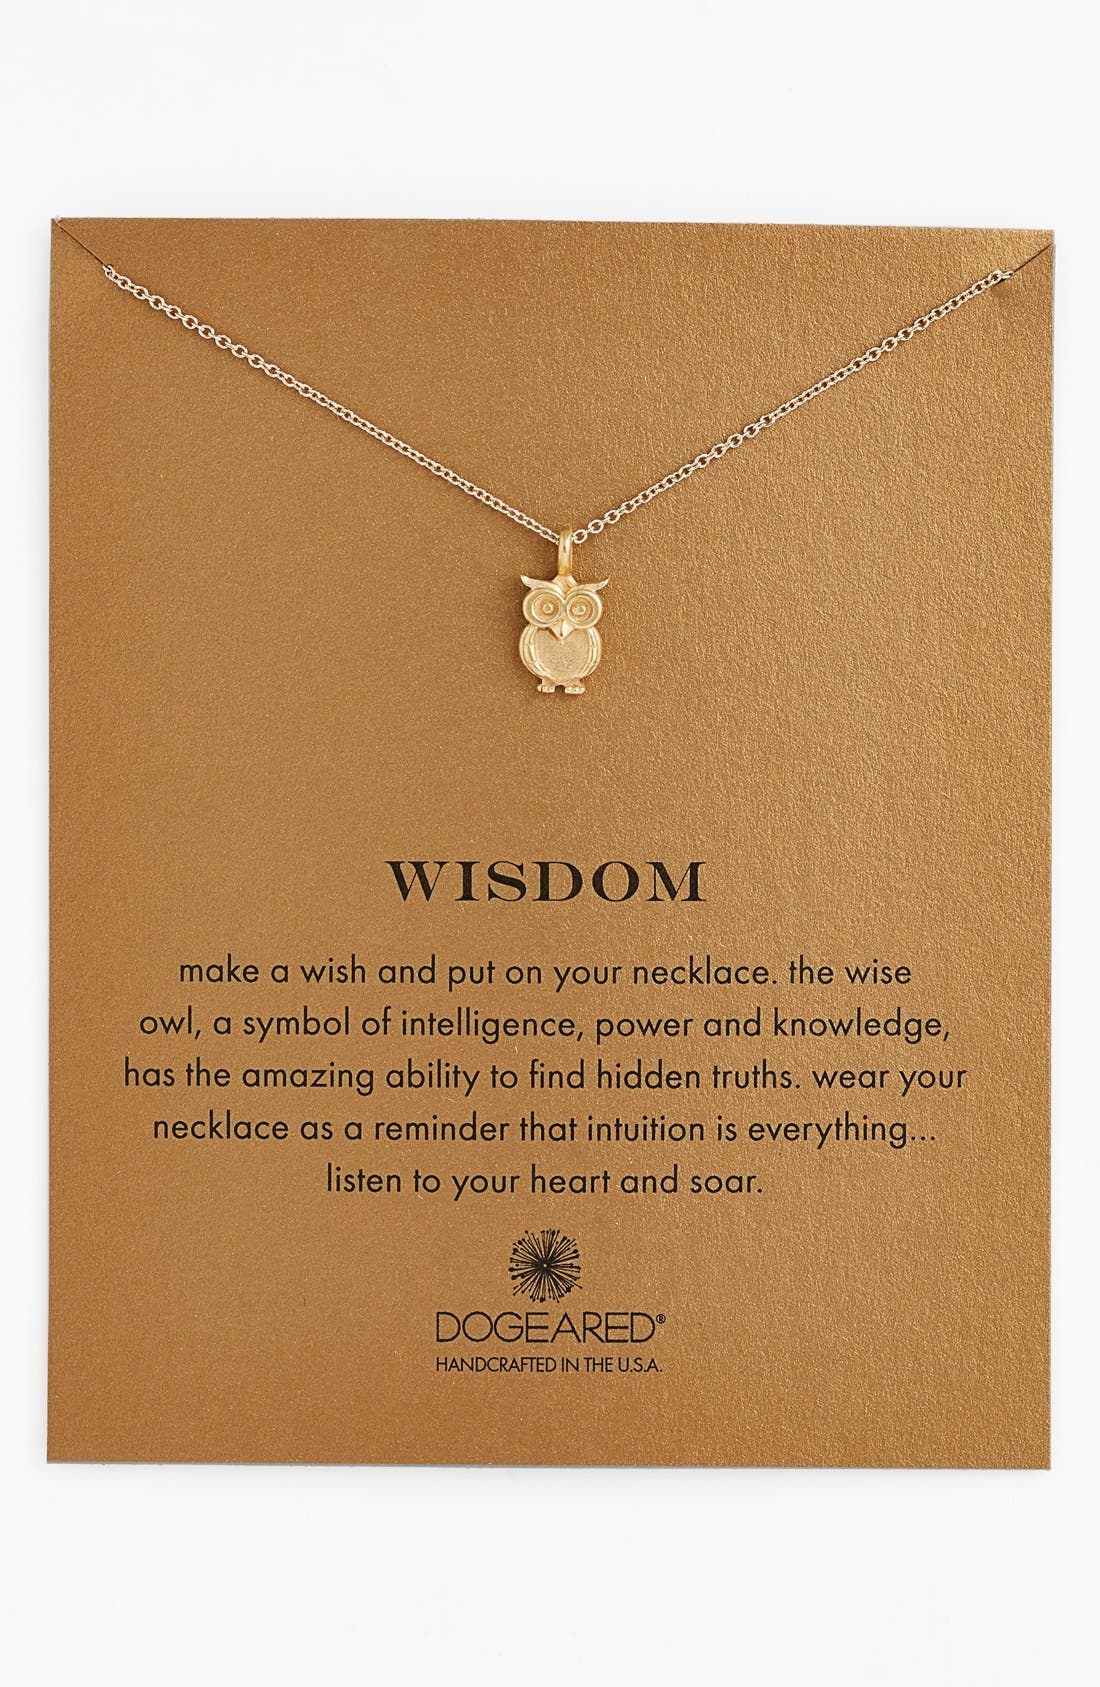 Alternate Image 1 Selected - Dogeared 'Reminder - Wisdom' Boxed Owl Pendant Necklace